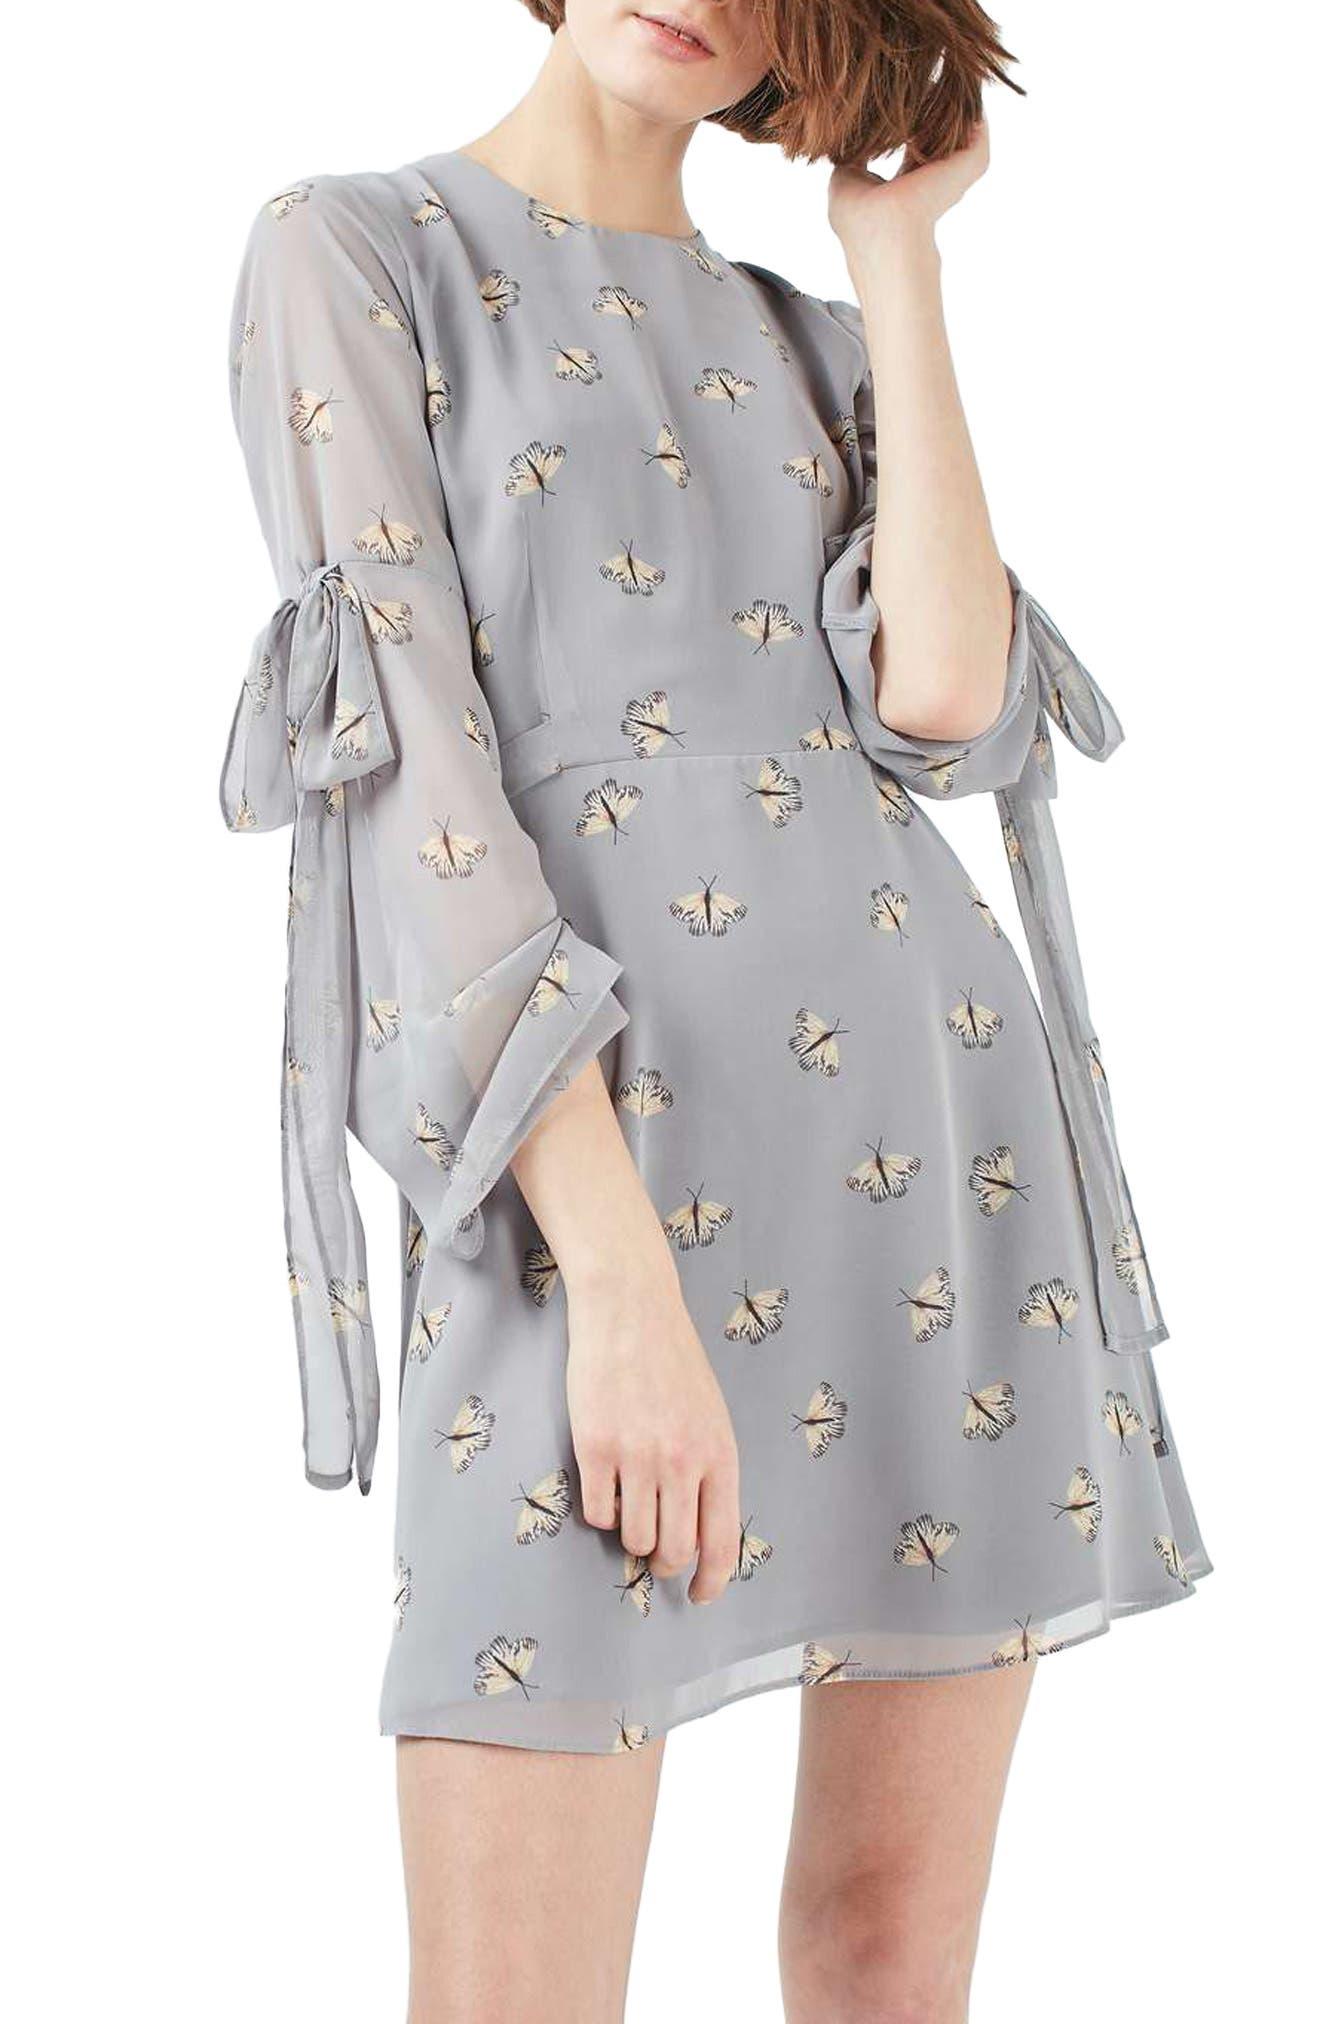 Moth Print Skater Dress,                         Main,                         color, 050